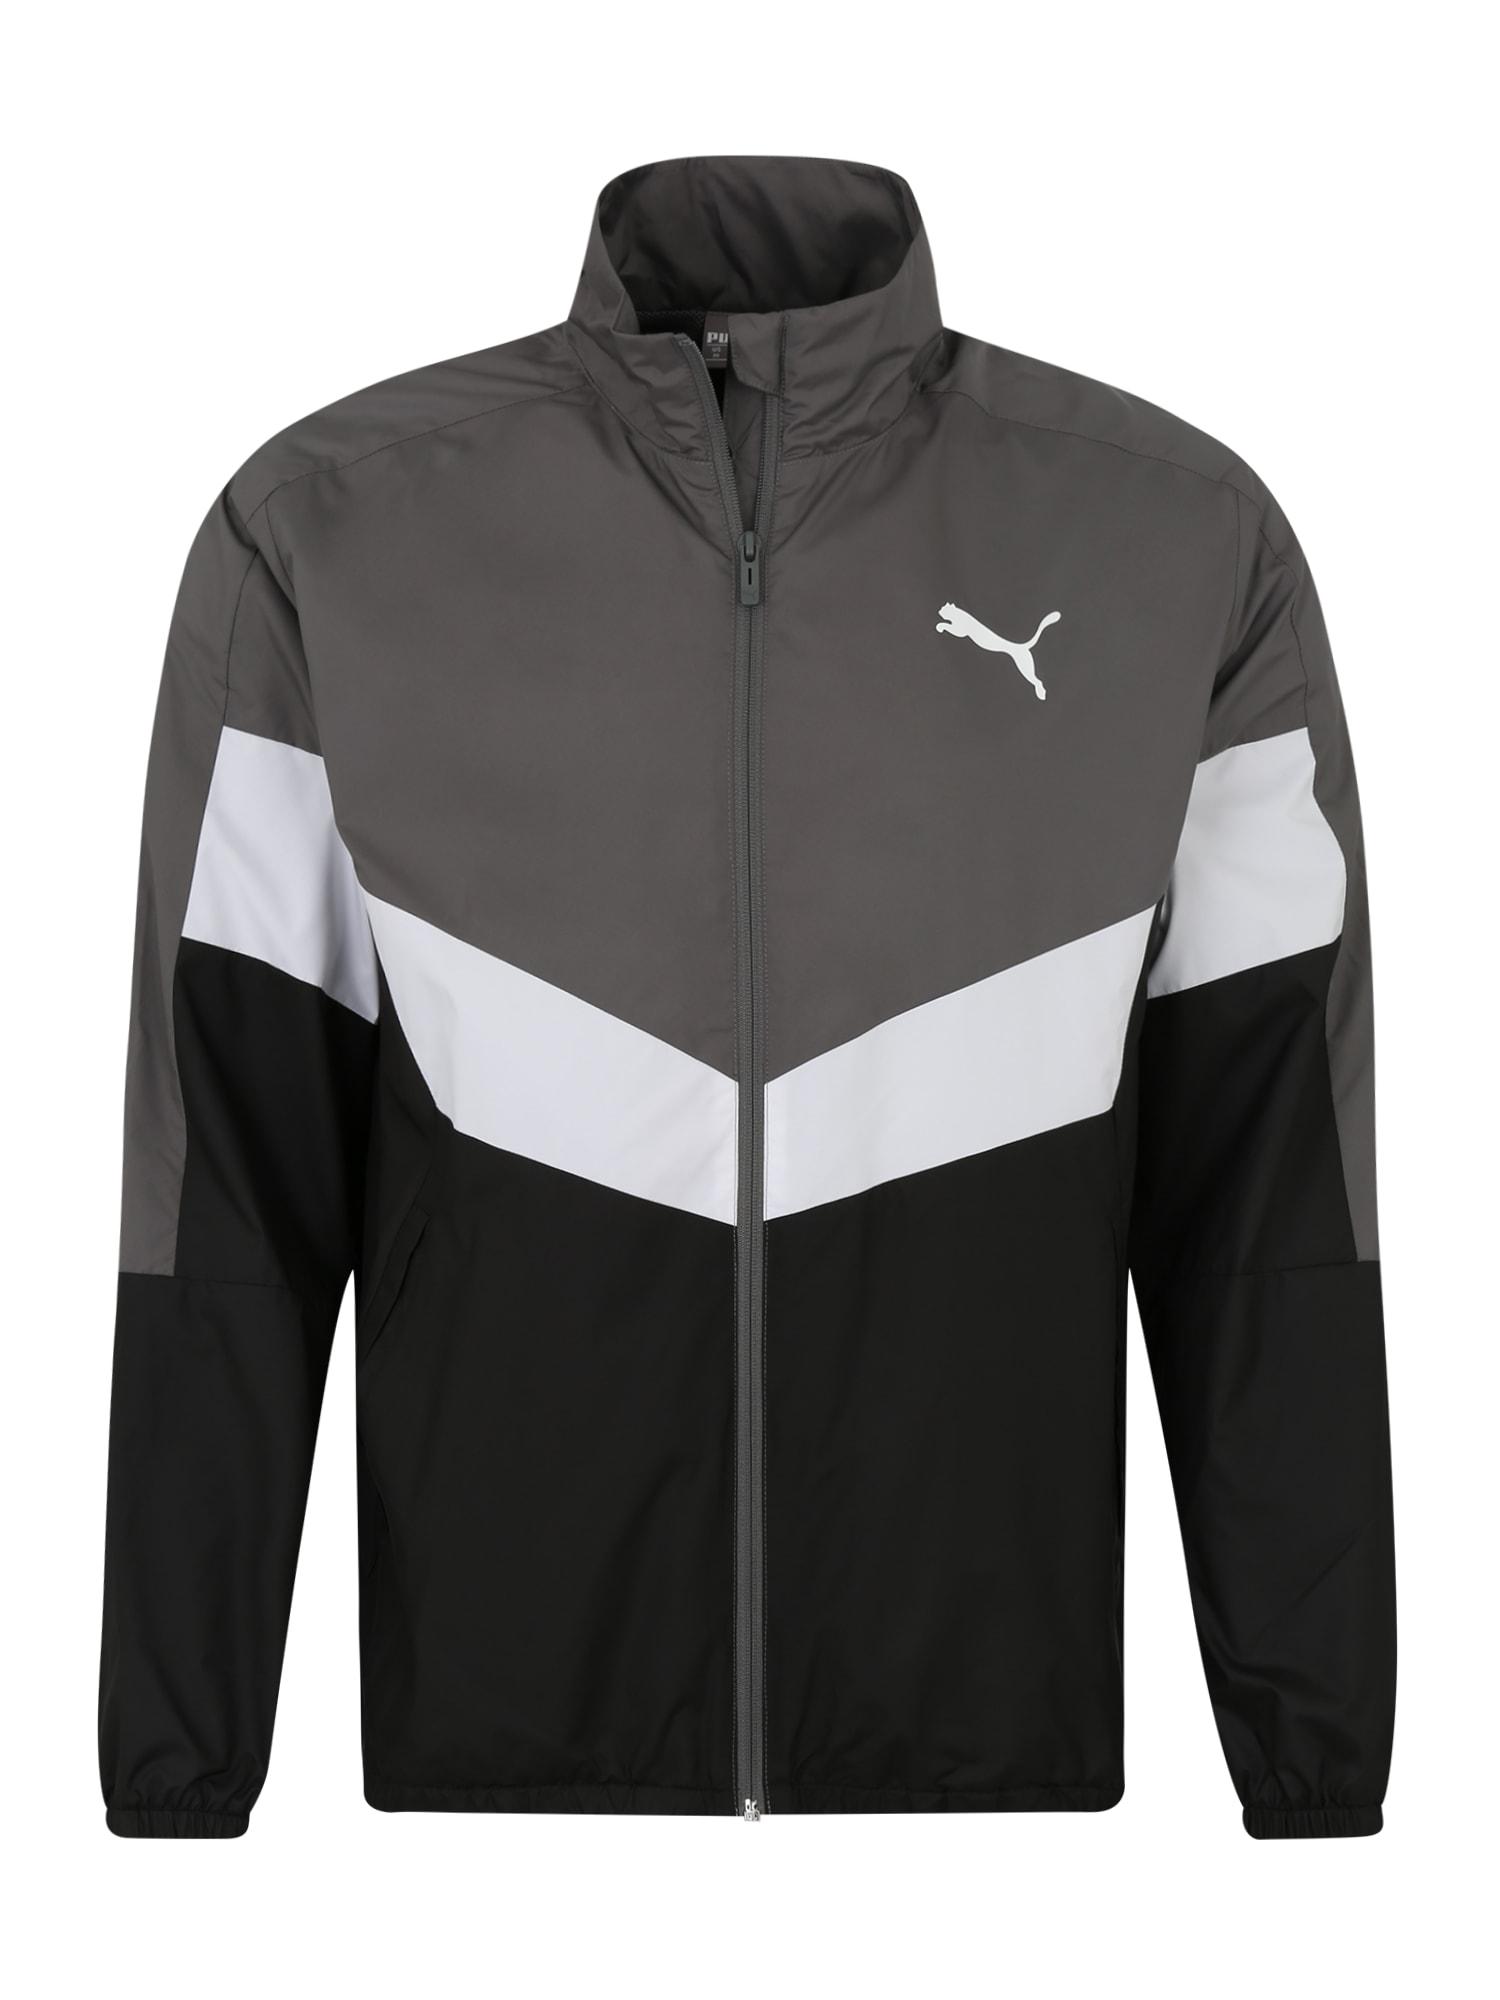 PUMA Džemperis treniruotėms 'CB Windbreaker' juoda / pilka / balta